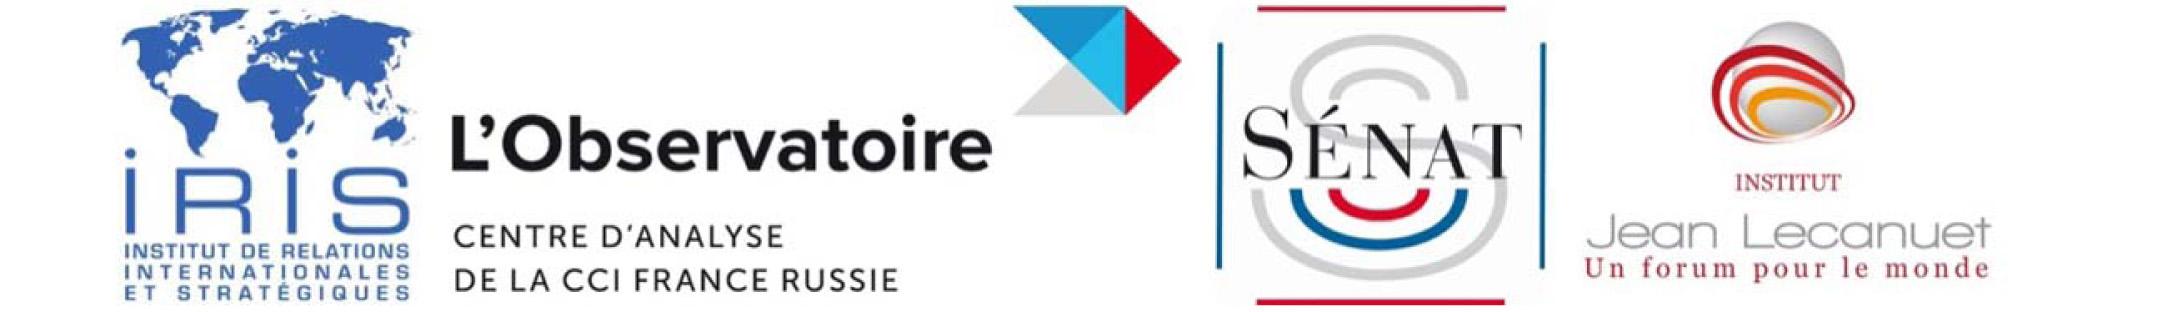 Microsoft Word - Invitation colloque France-Europe-Russie, schis